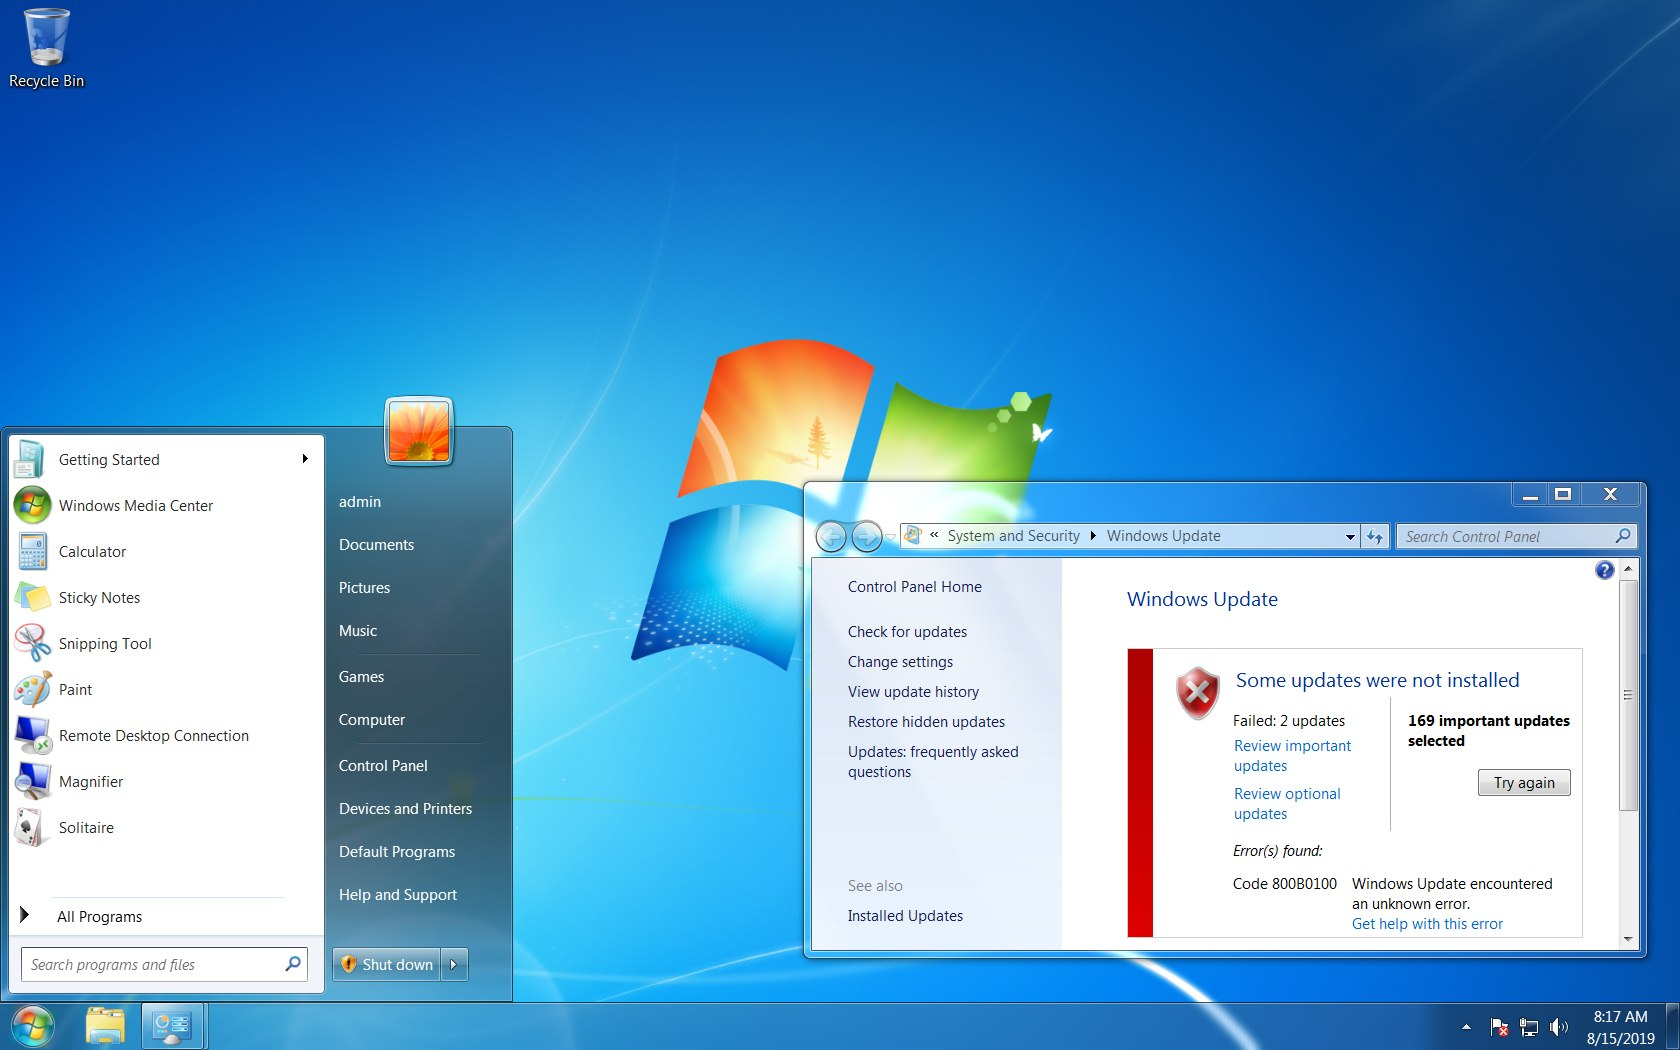 Windows 7 to get full-screen upgrade to Windows 10 warning ...